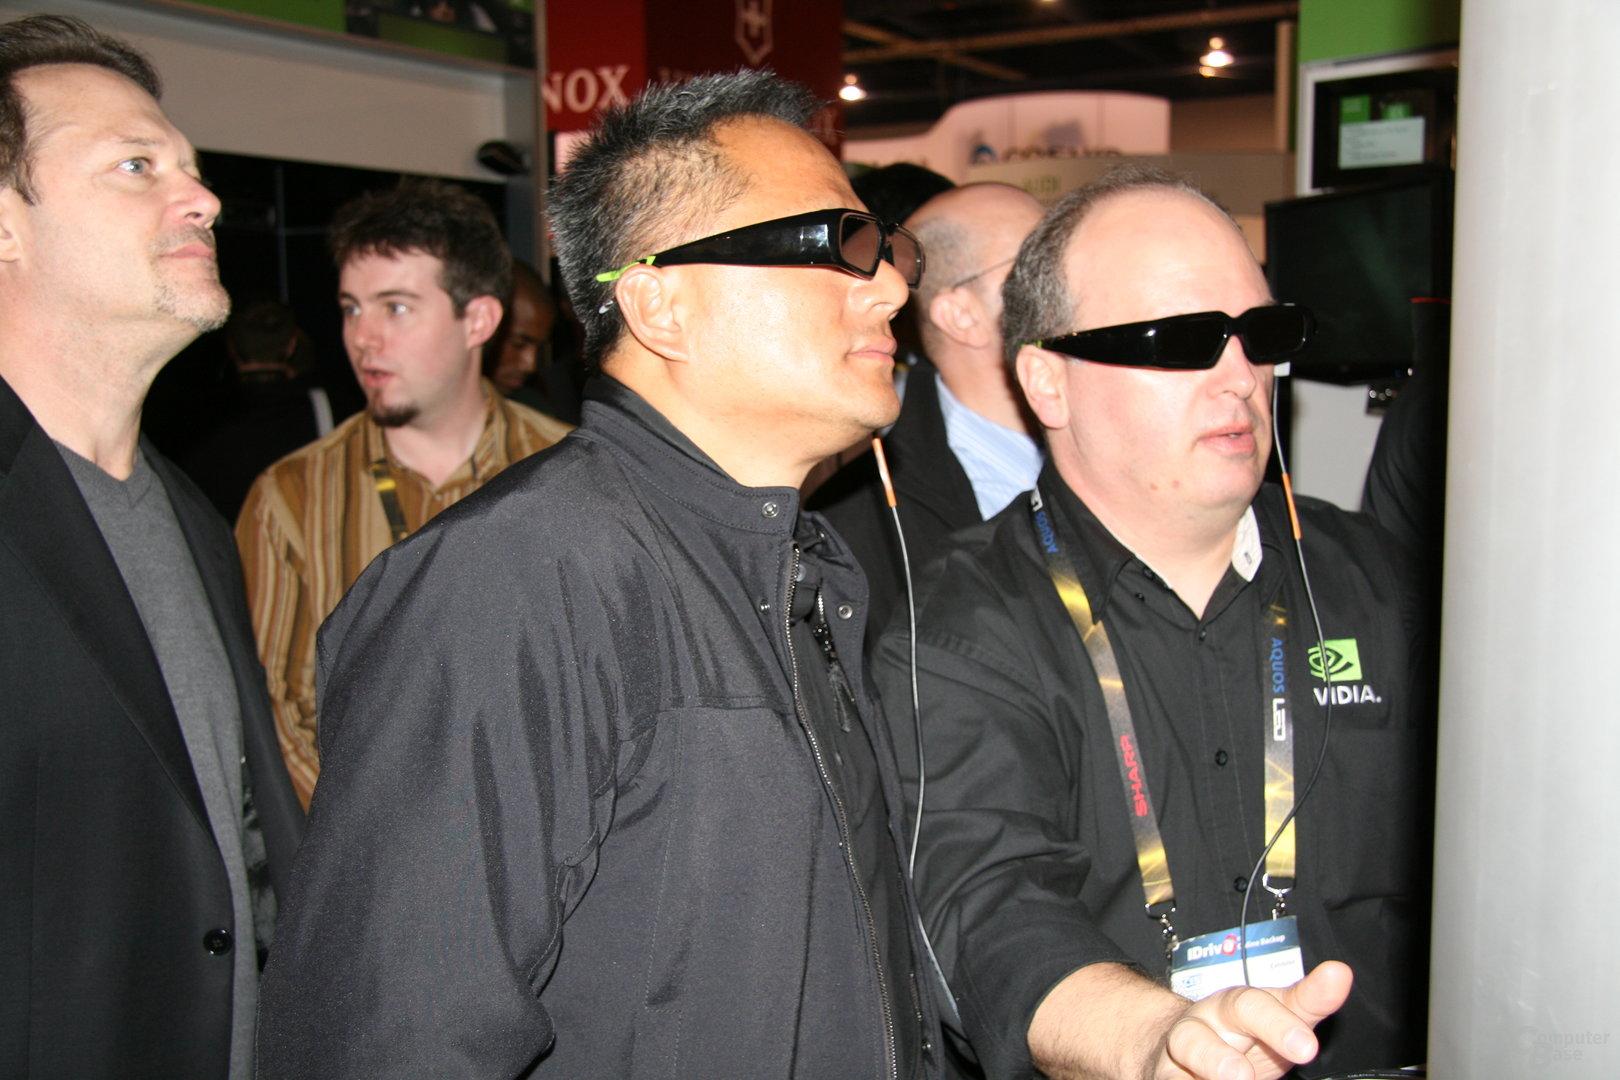 CEO Huang bewundert lauffähige Nvidia GeForce GF100 Fermi